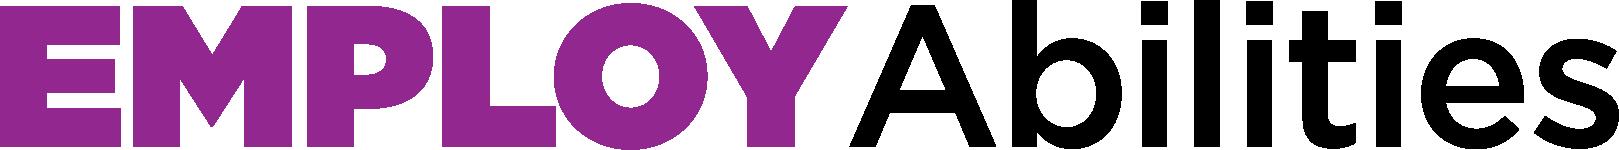 EmployAbilities logo